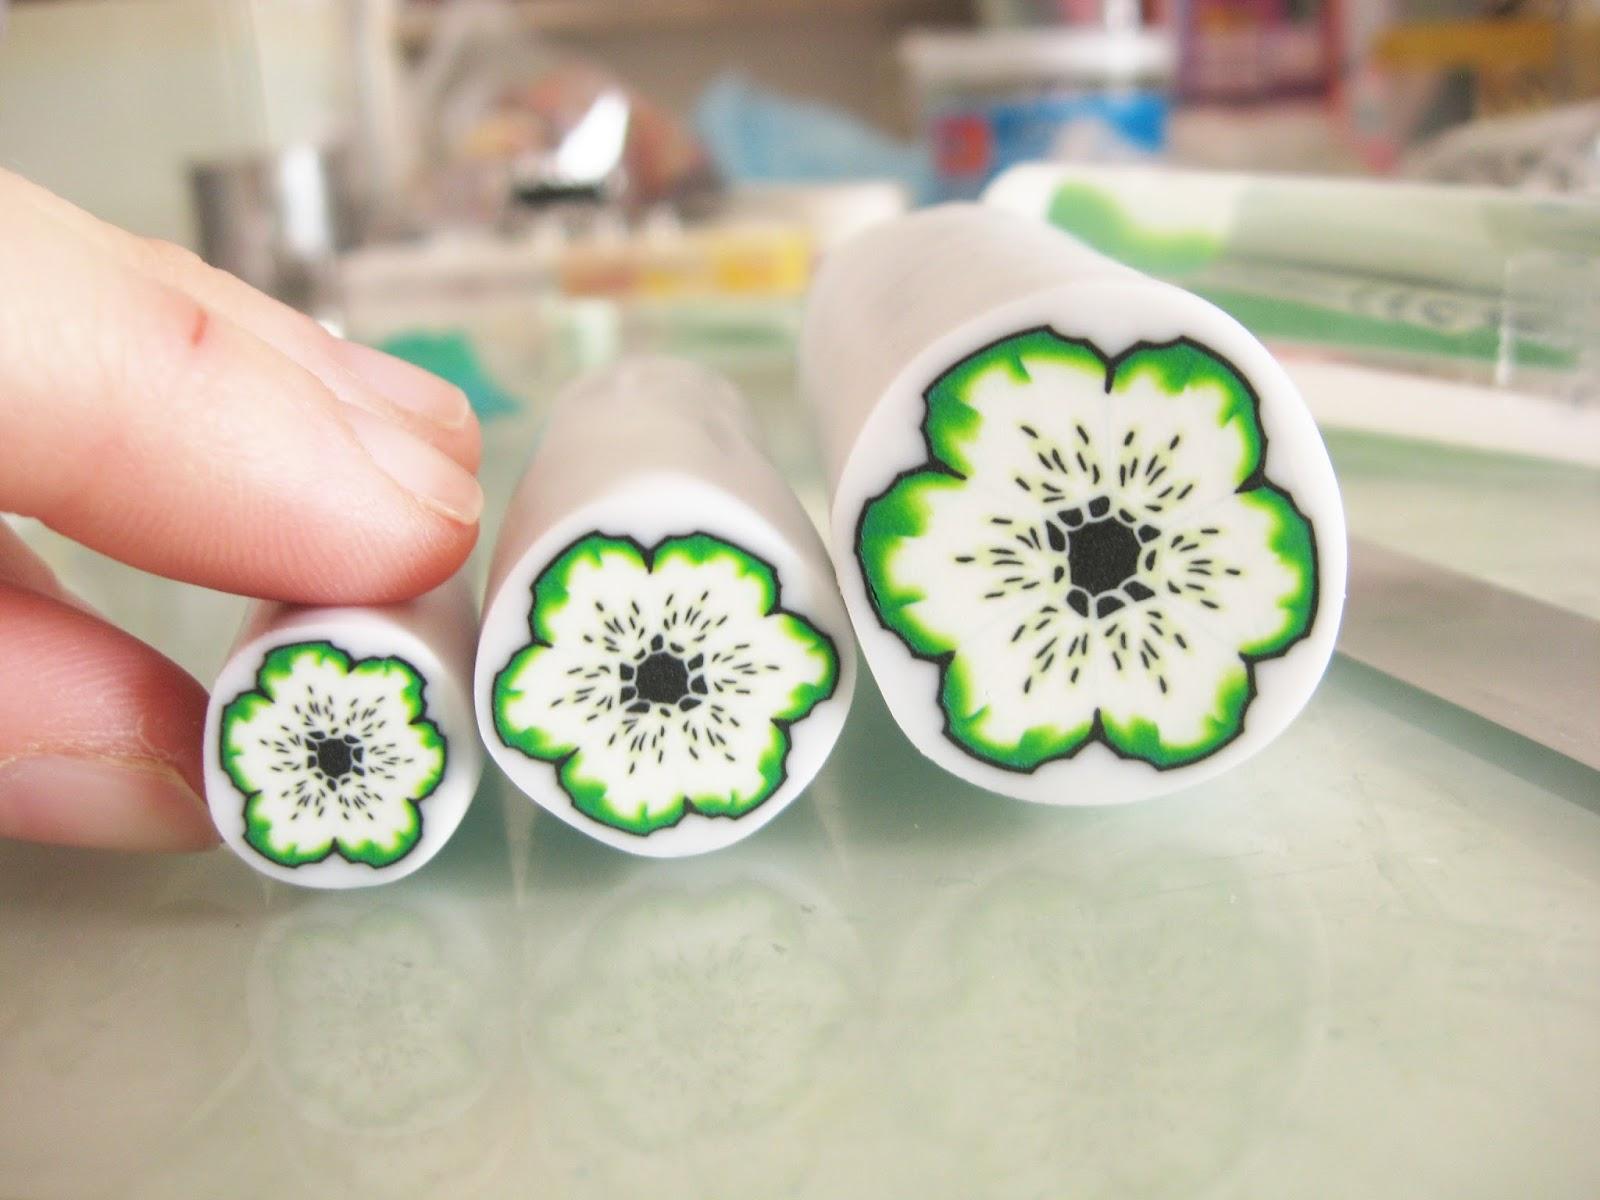 cane polymer claus fleur verte